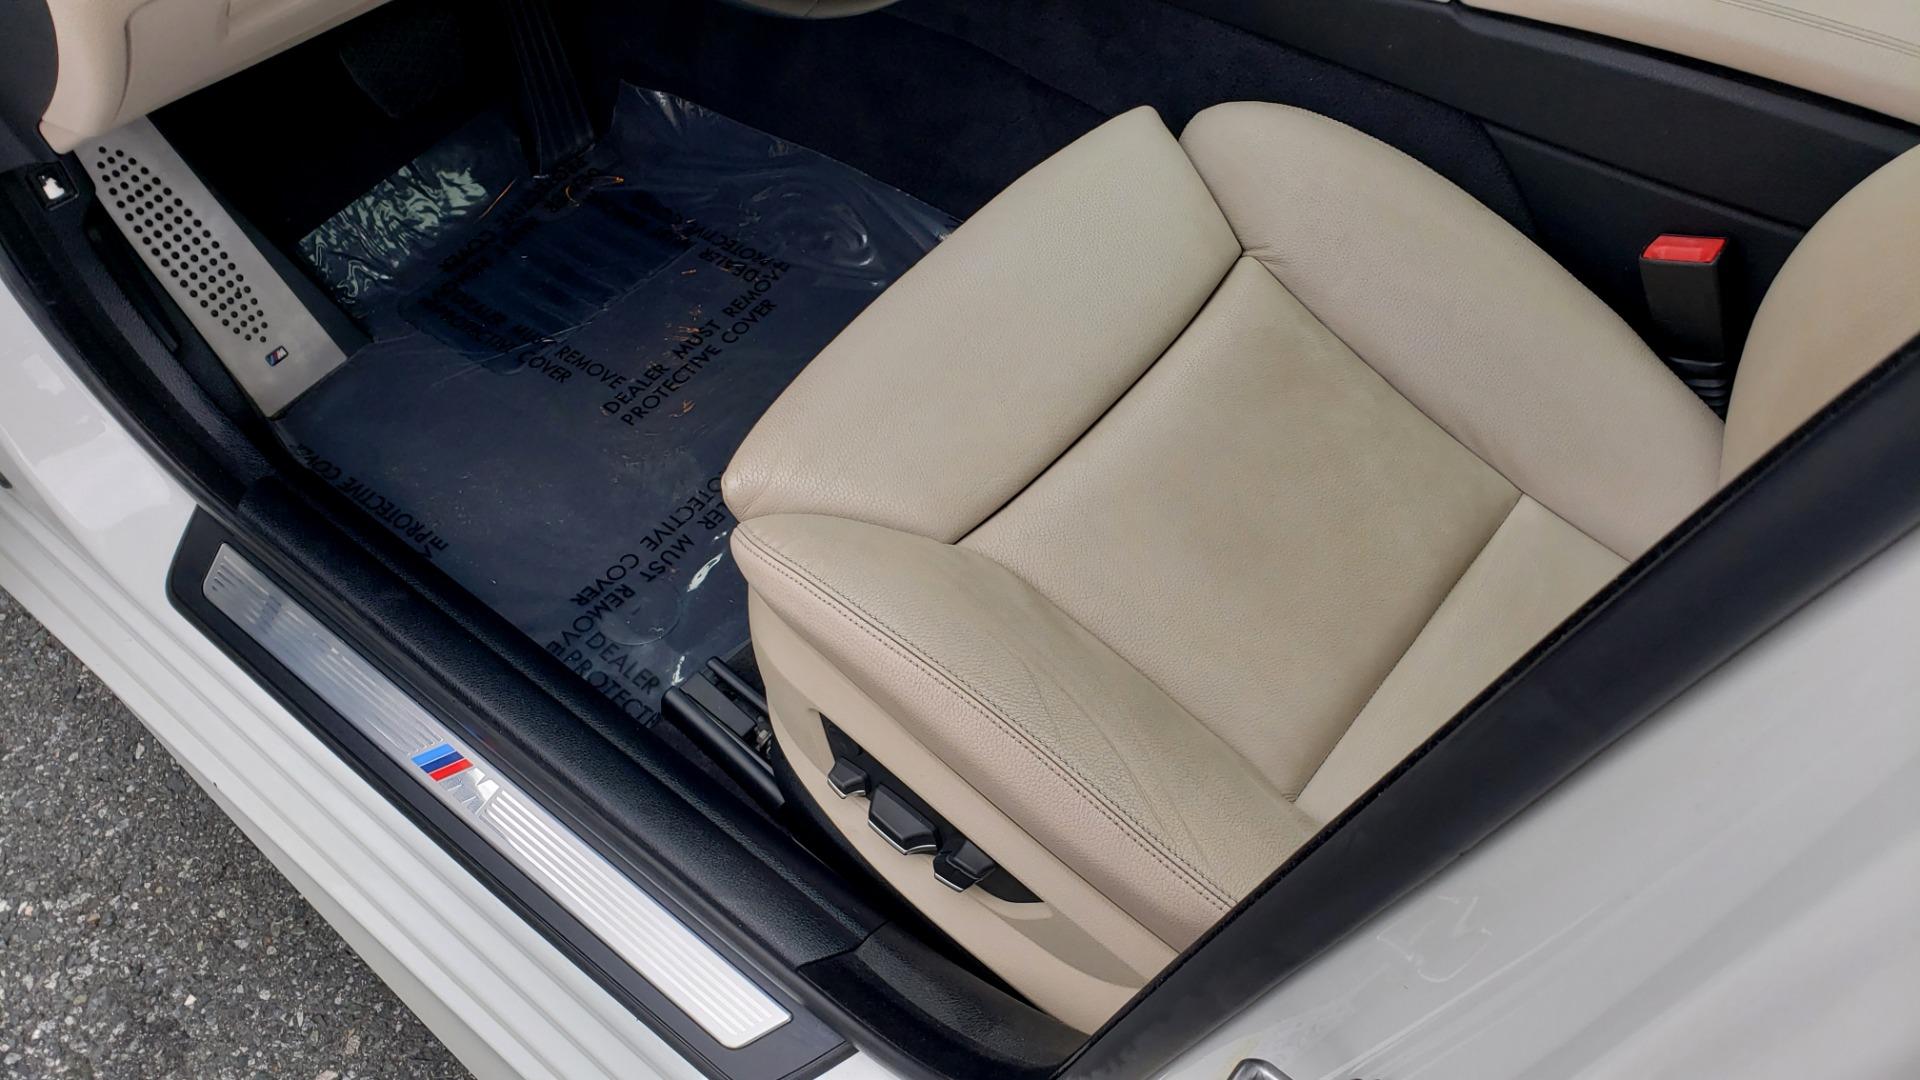 Used 2012 BMW 5 SERIES 550I M SPORT / NAV / CONV PKG / SUNROOF / PREM SND / REARVIEW for sale Sold at Formula Imports in Charlotte NC 28227 24